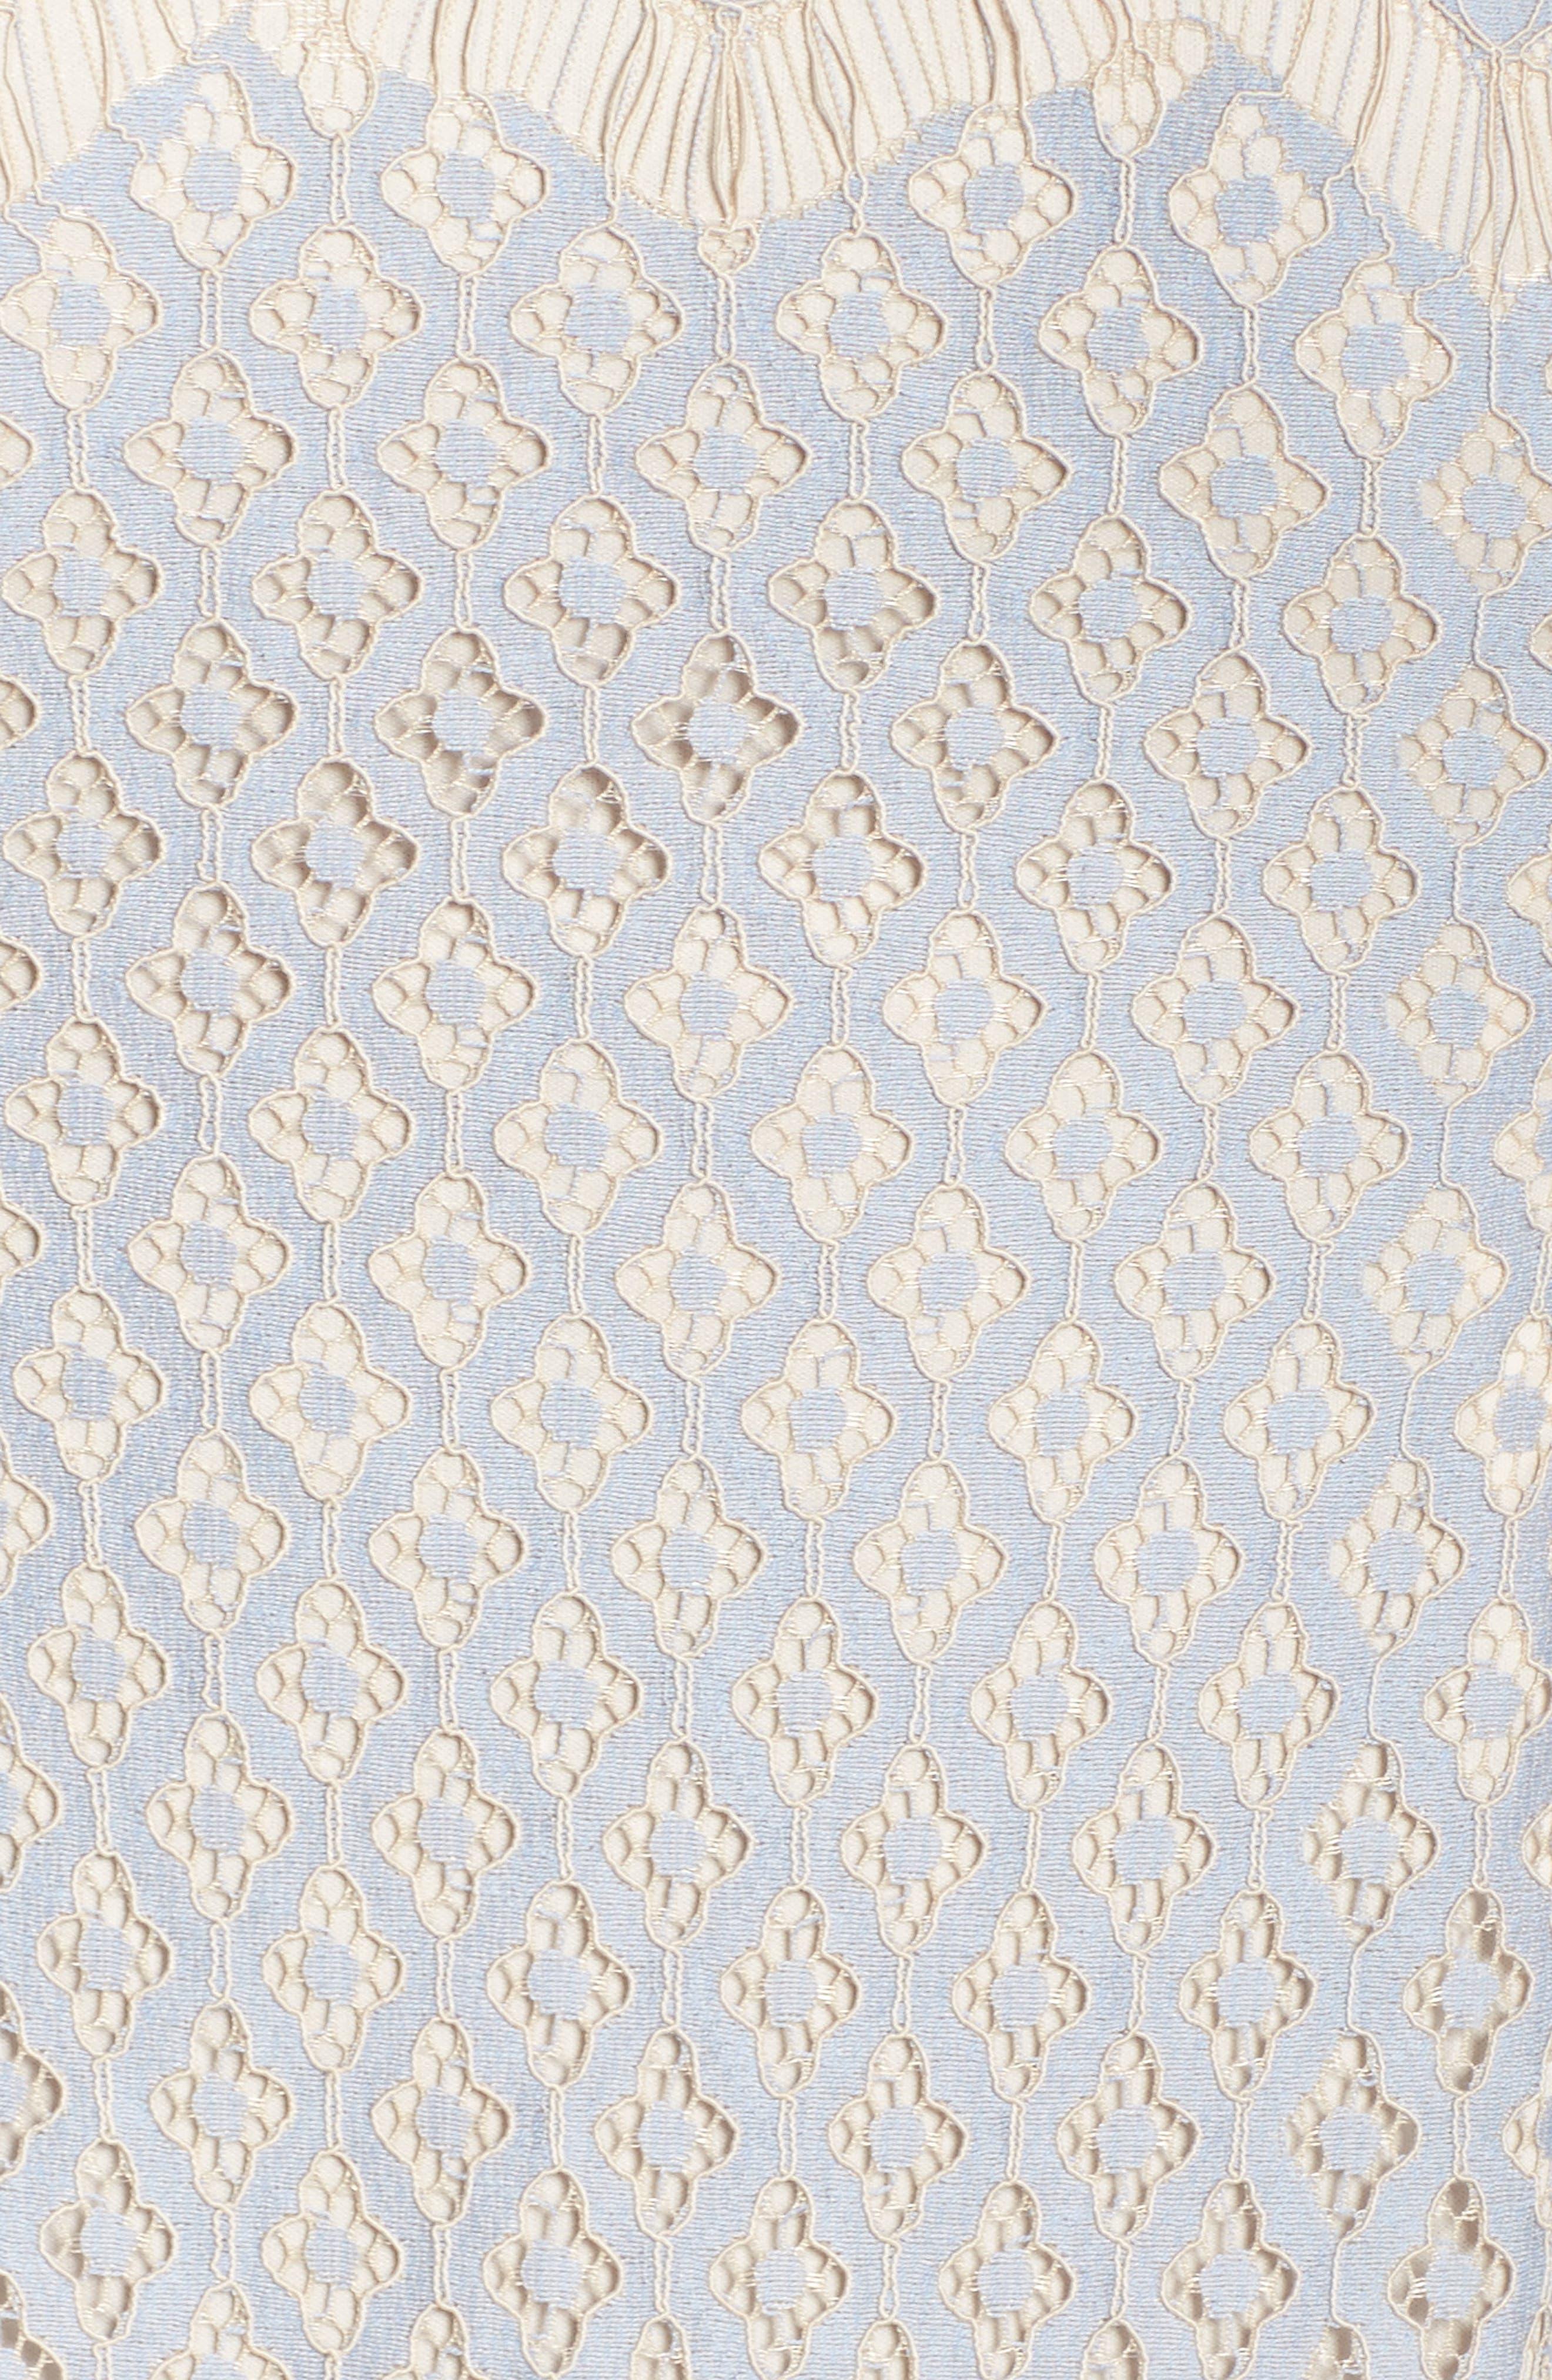 Bell Sleeve Georgia Lace Sheath Dress,                             Alternate thumbnail 5, color,                             Sky/ Cadmium